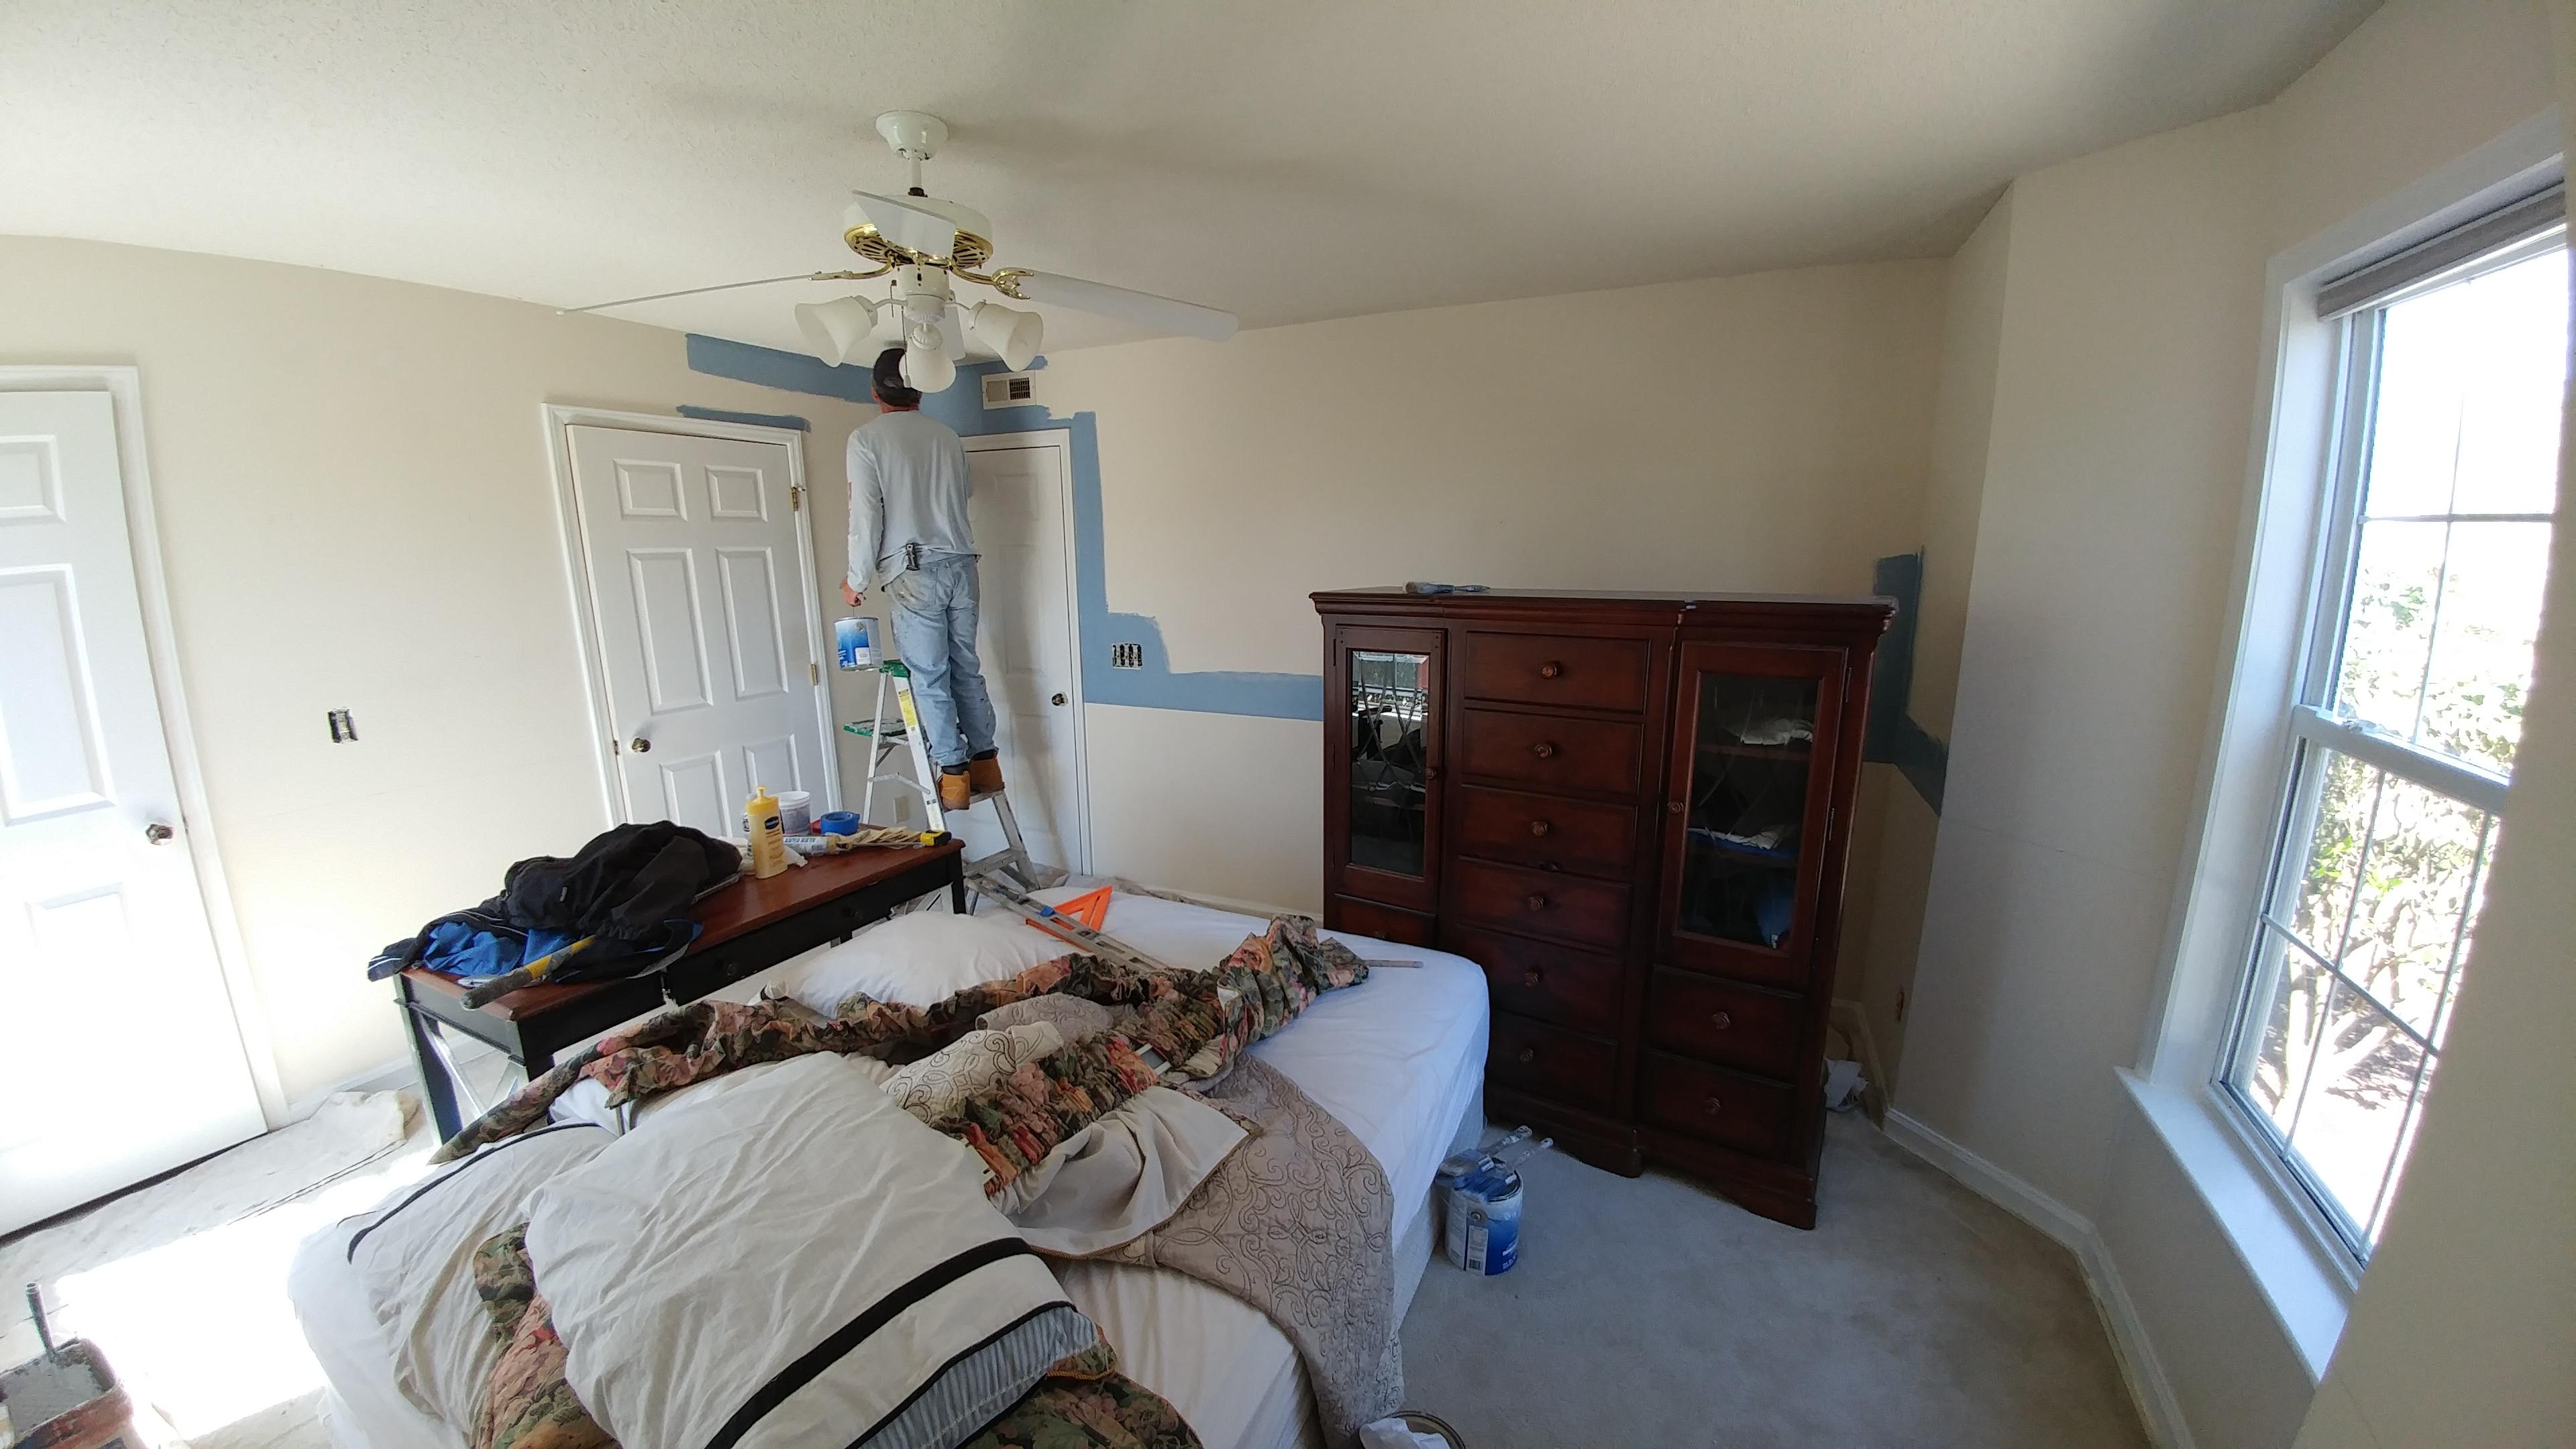 Bedroom Painting In Greensboro Nc Greensboro Painters